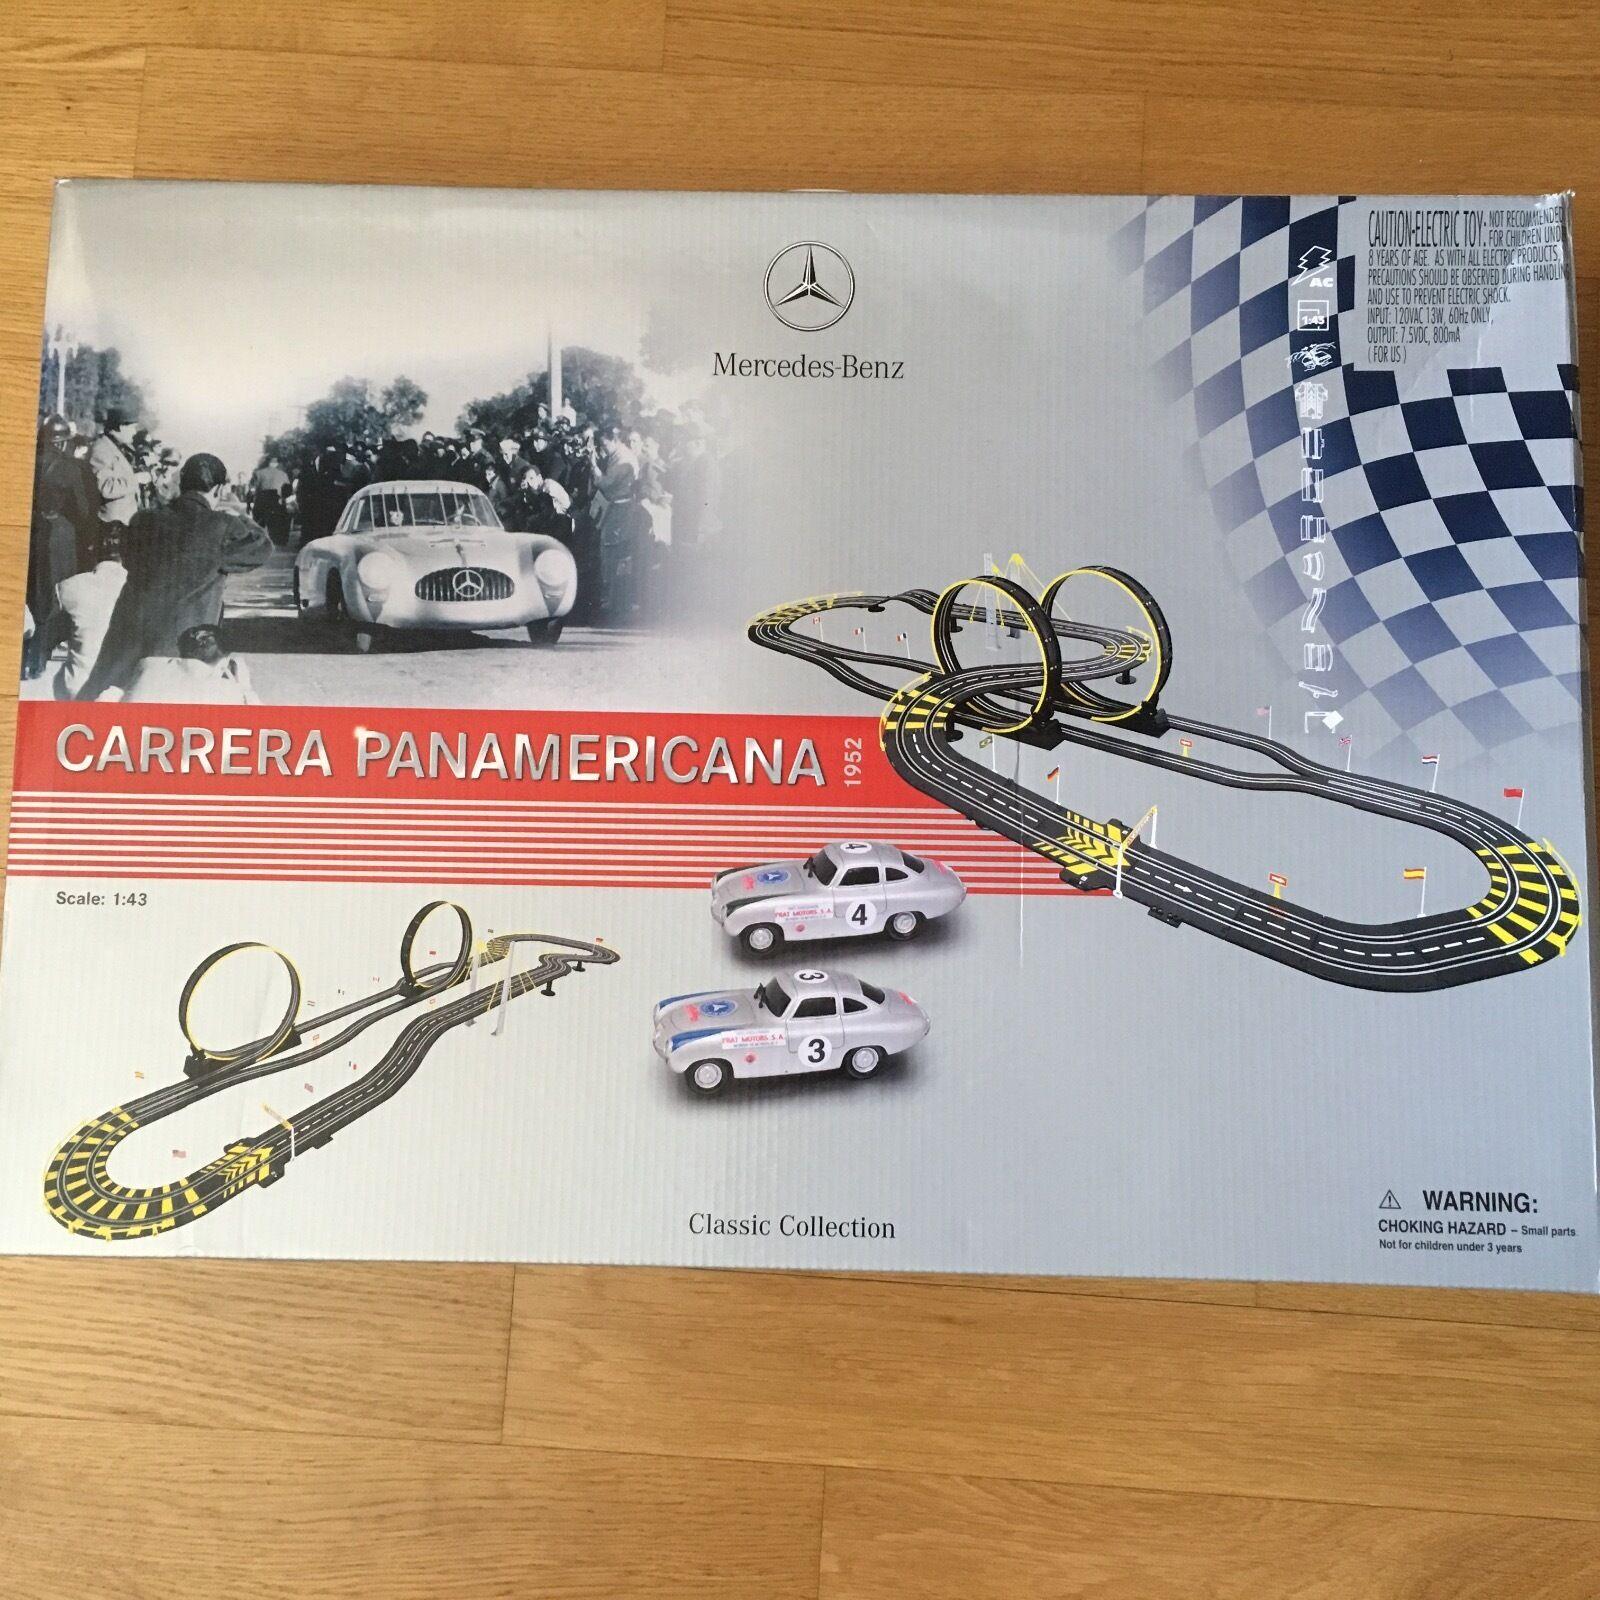 CARRERA PANAMERICANA 1952, 1 43, Mercedes-Benz Classic Collection